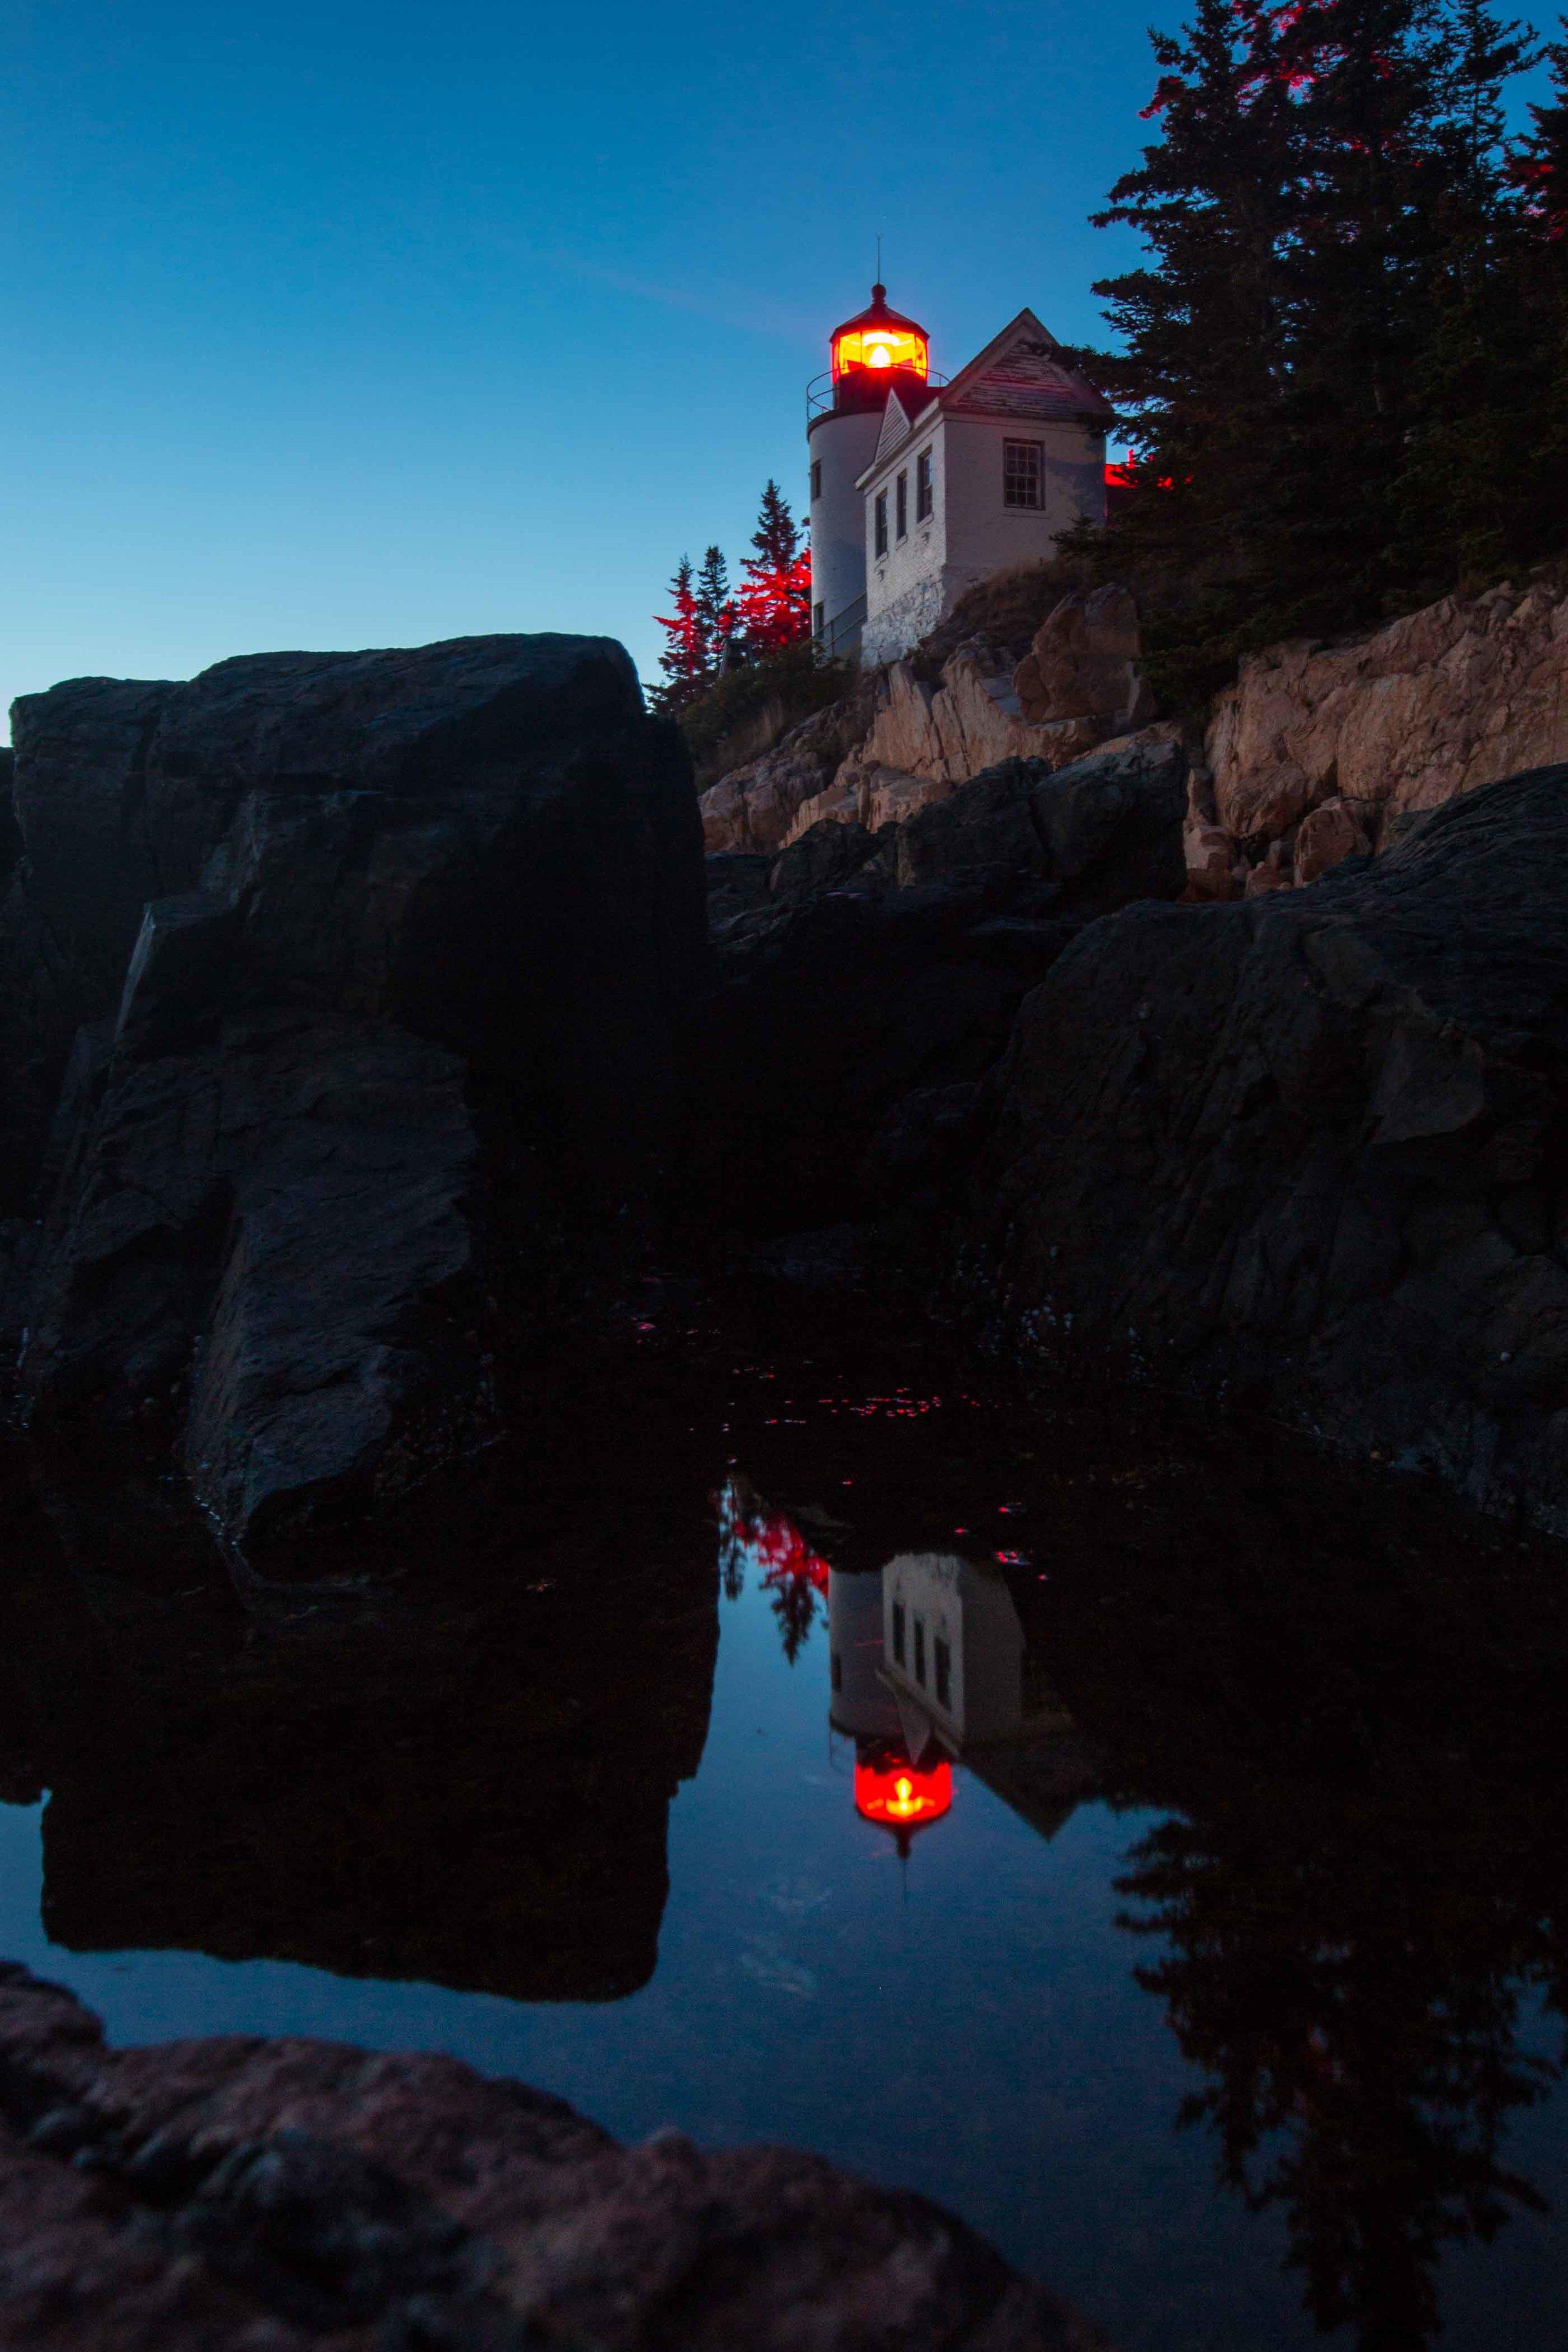 Bass Harbor Reflection ISO 1000 / 27mm / f11 / 30 sec